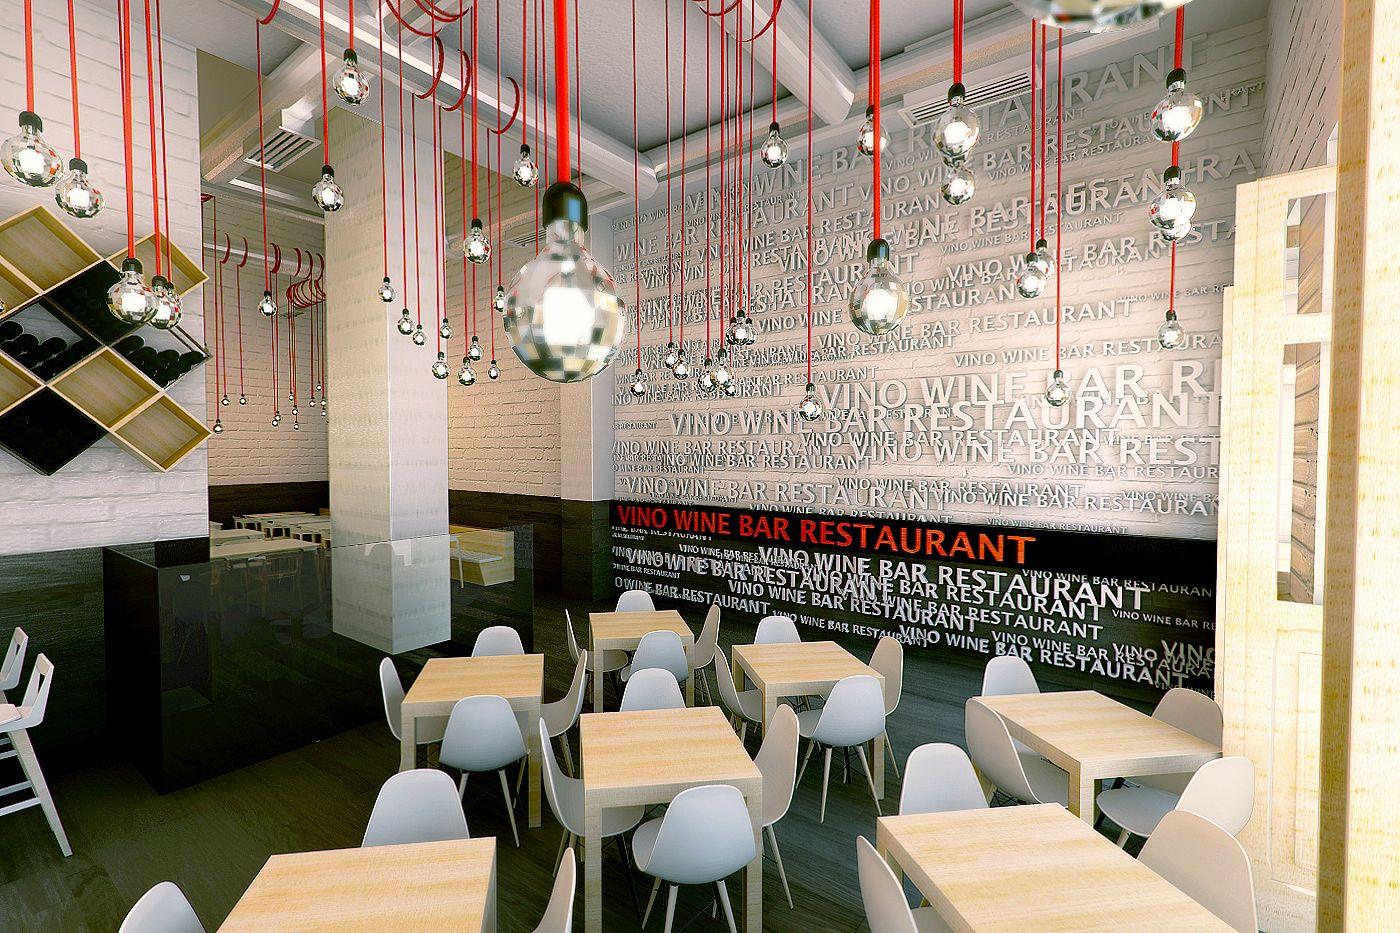 vino wine bar restaurant | projects | Pinterest